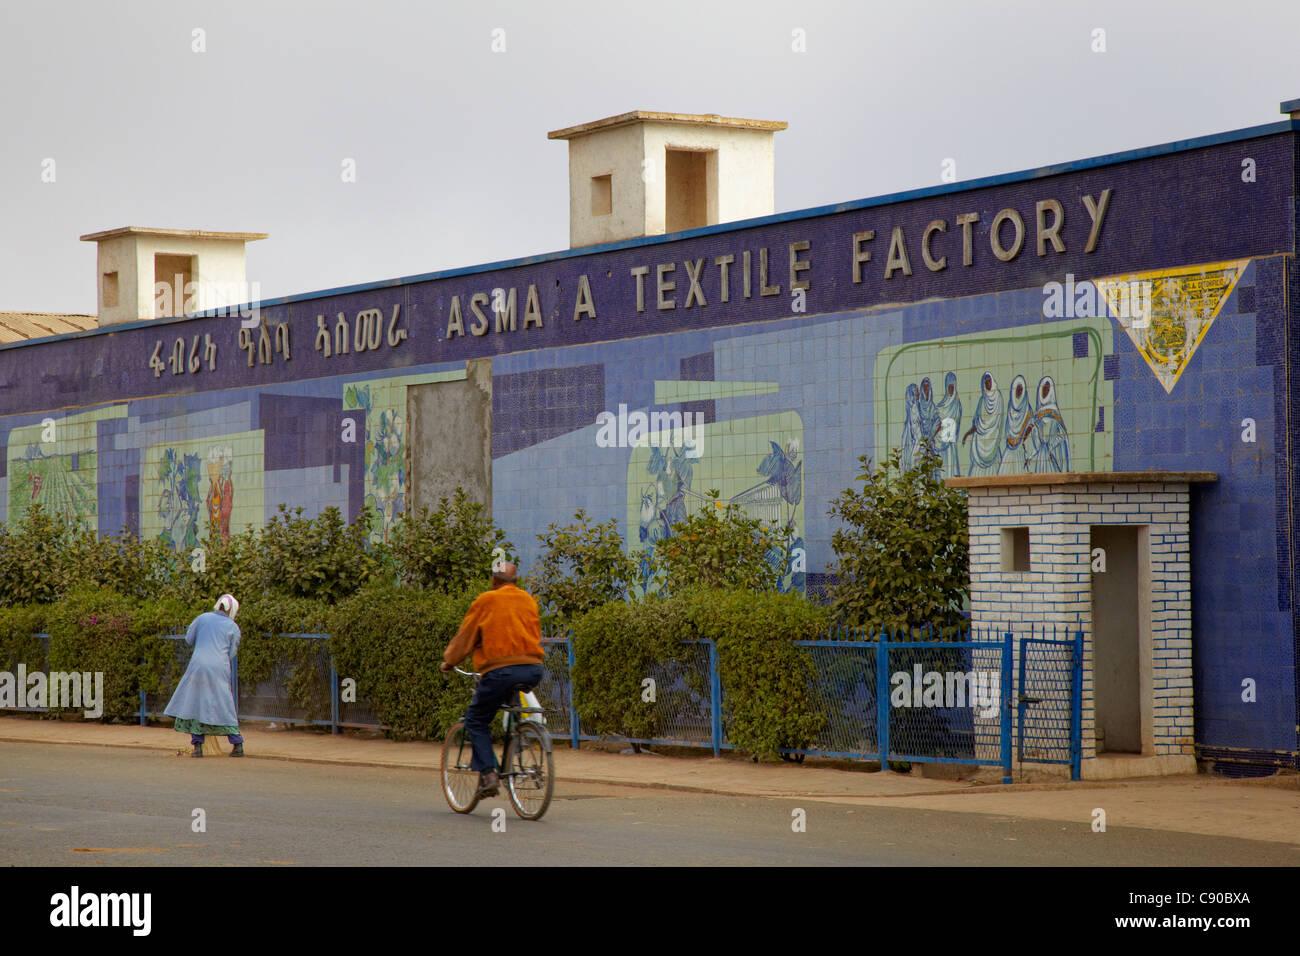 Asmara Textile Factory, Asmara, Eritrea, Africa - Stock Image